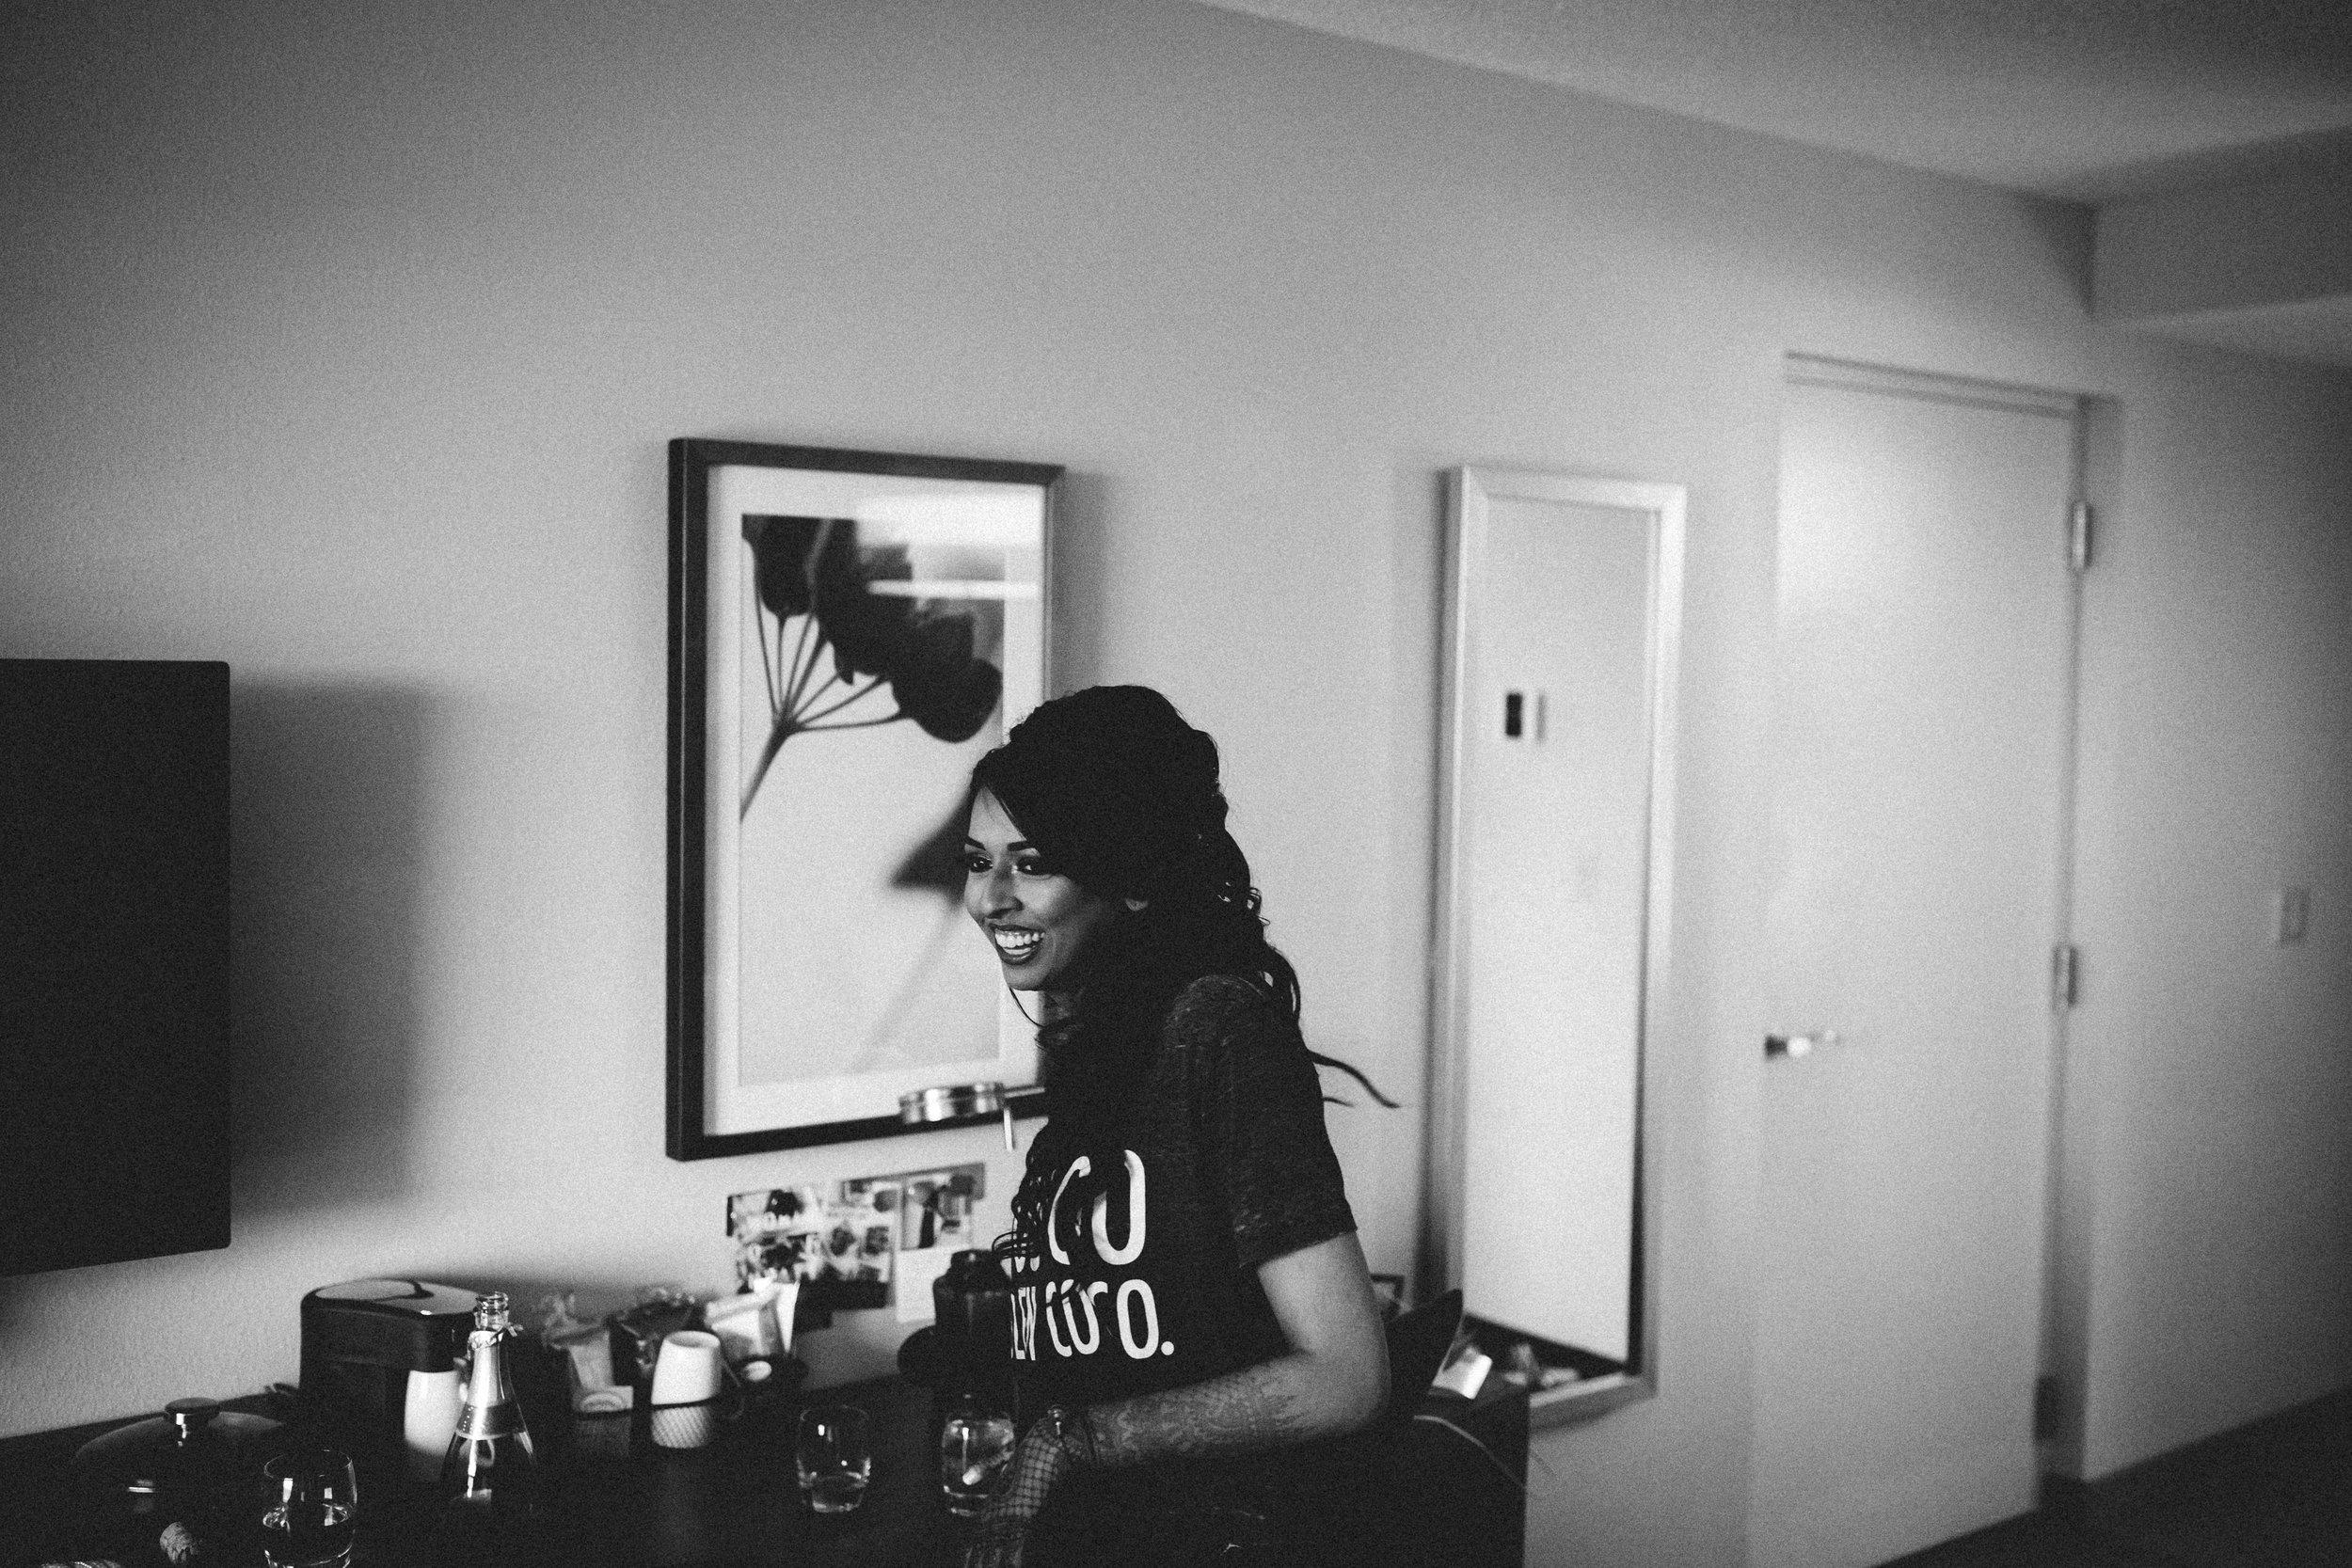 Aparna-Ankit-Patel-Shah-Detroit-Michigan-Shadow-Shine-Pictures-Photographers-Indian